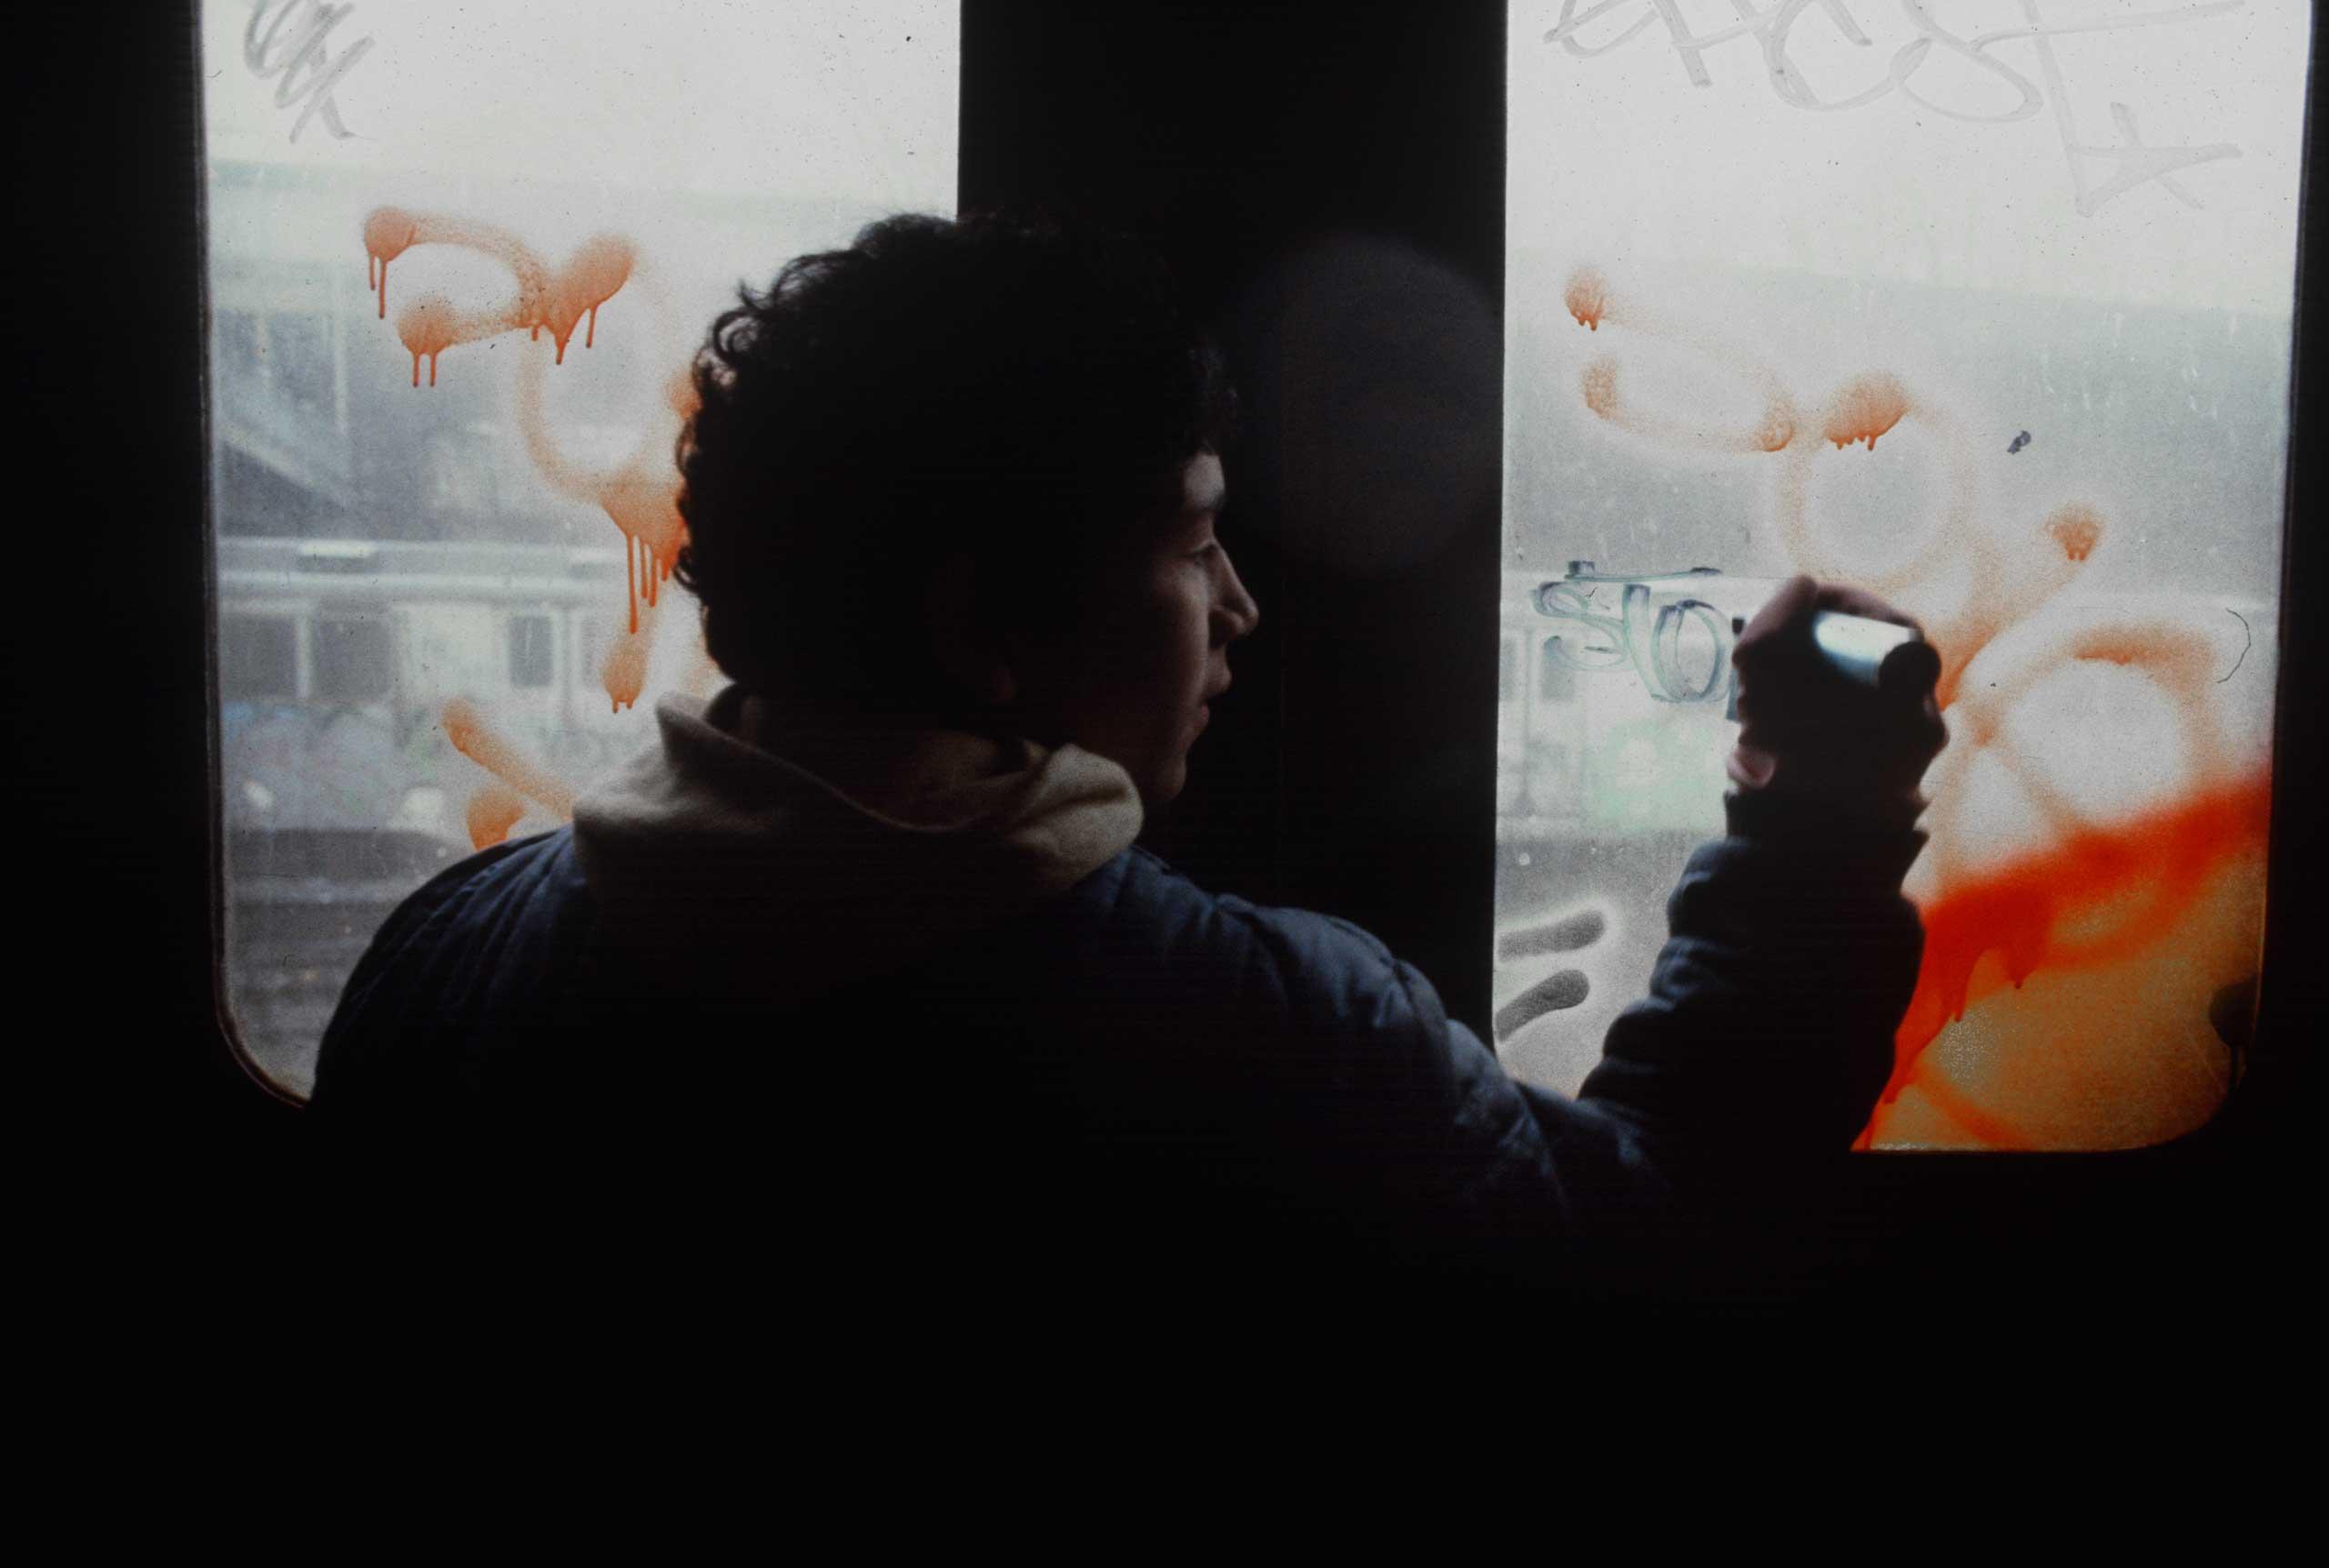 A young teen tags a D train subway car window in a South Bronx train yard, 1981.